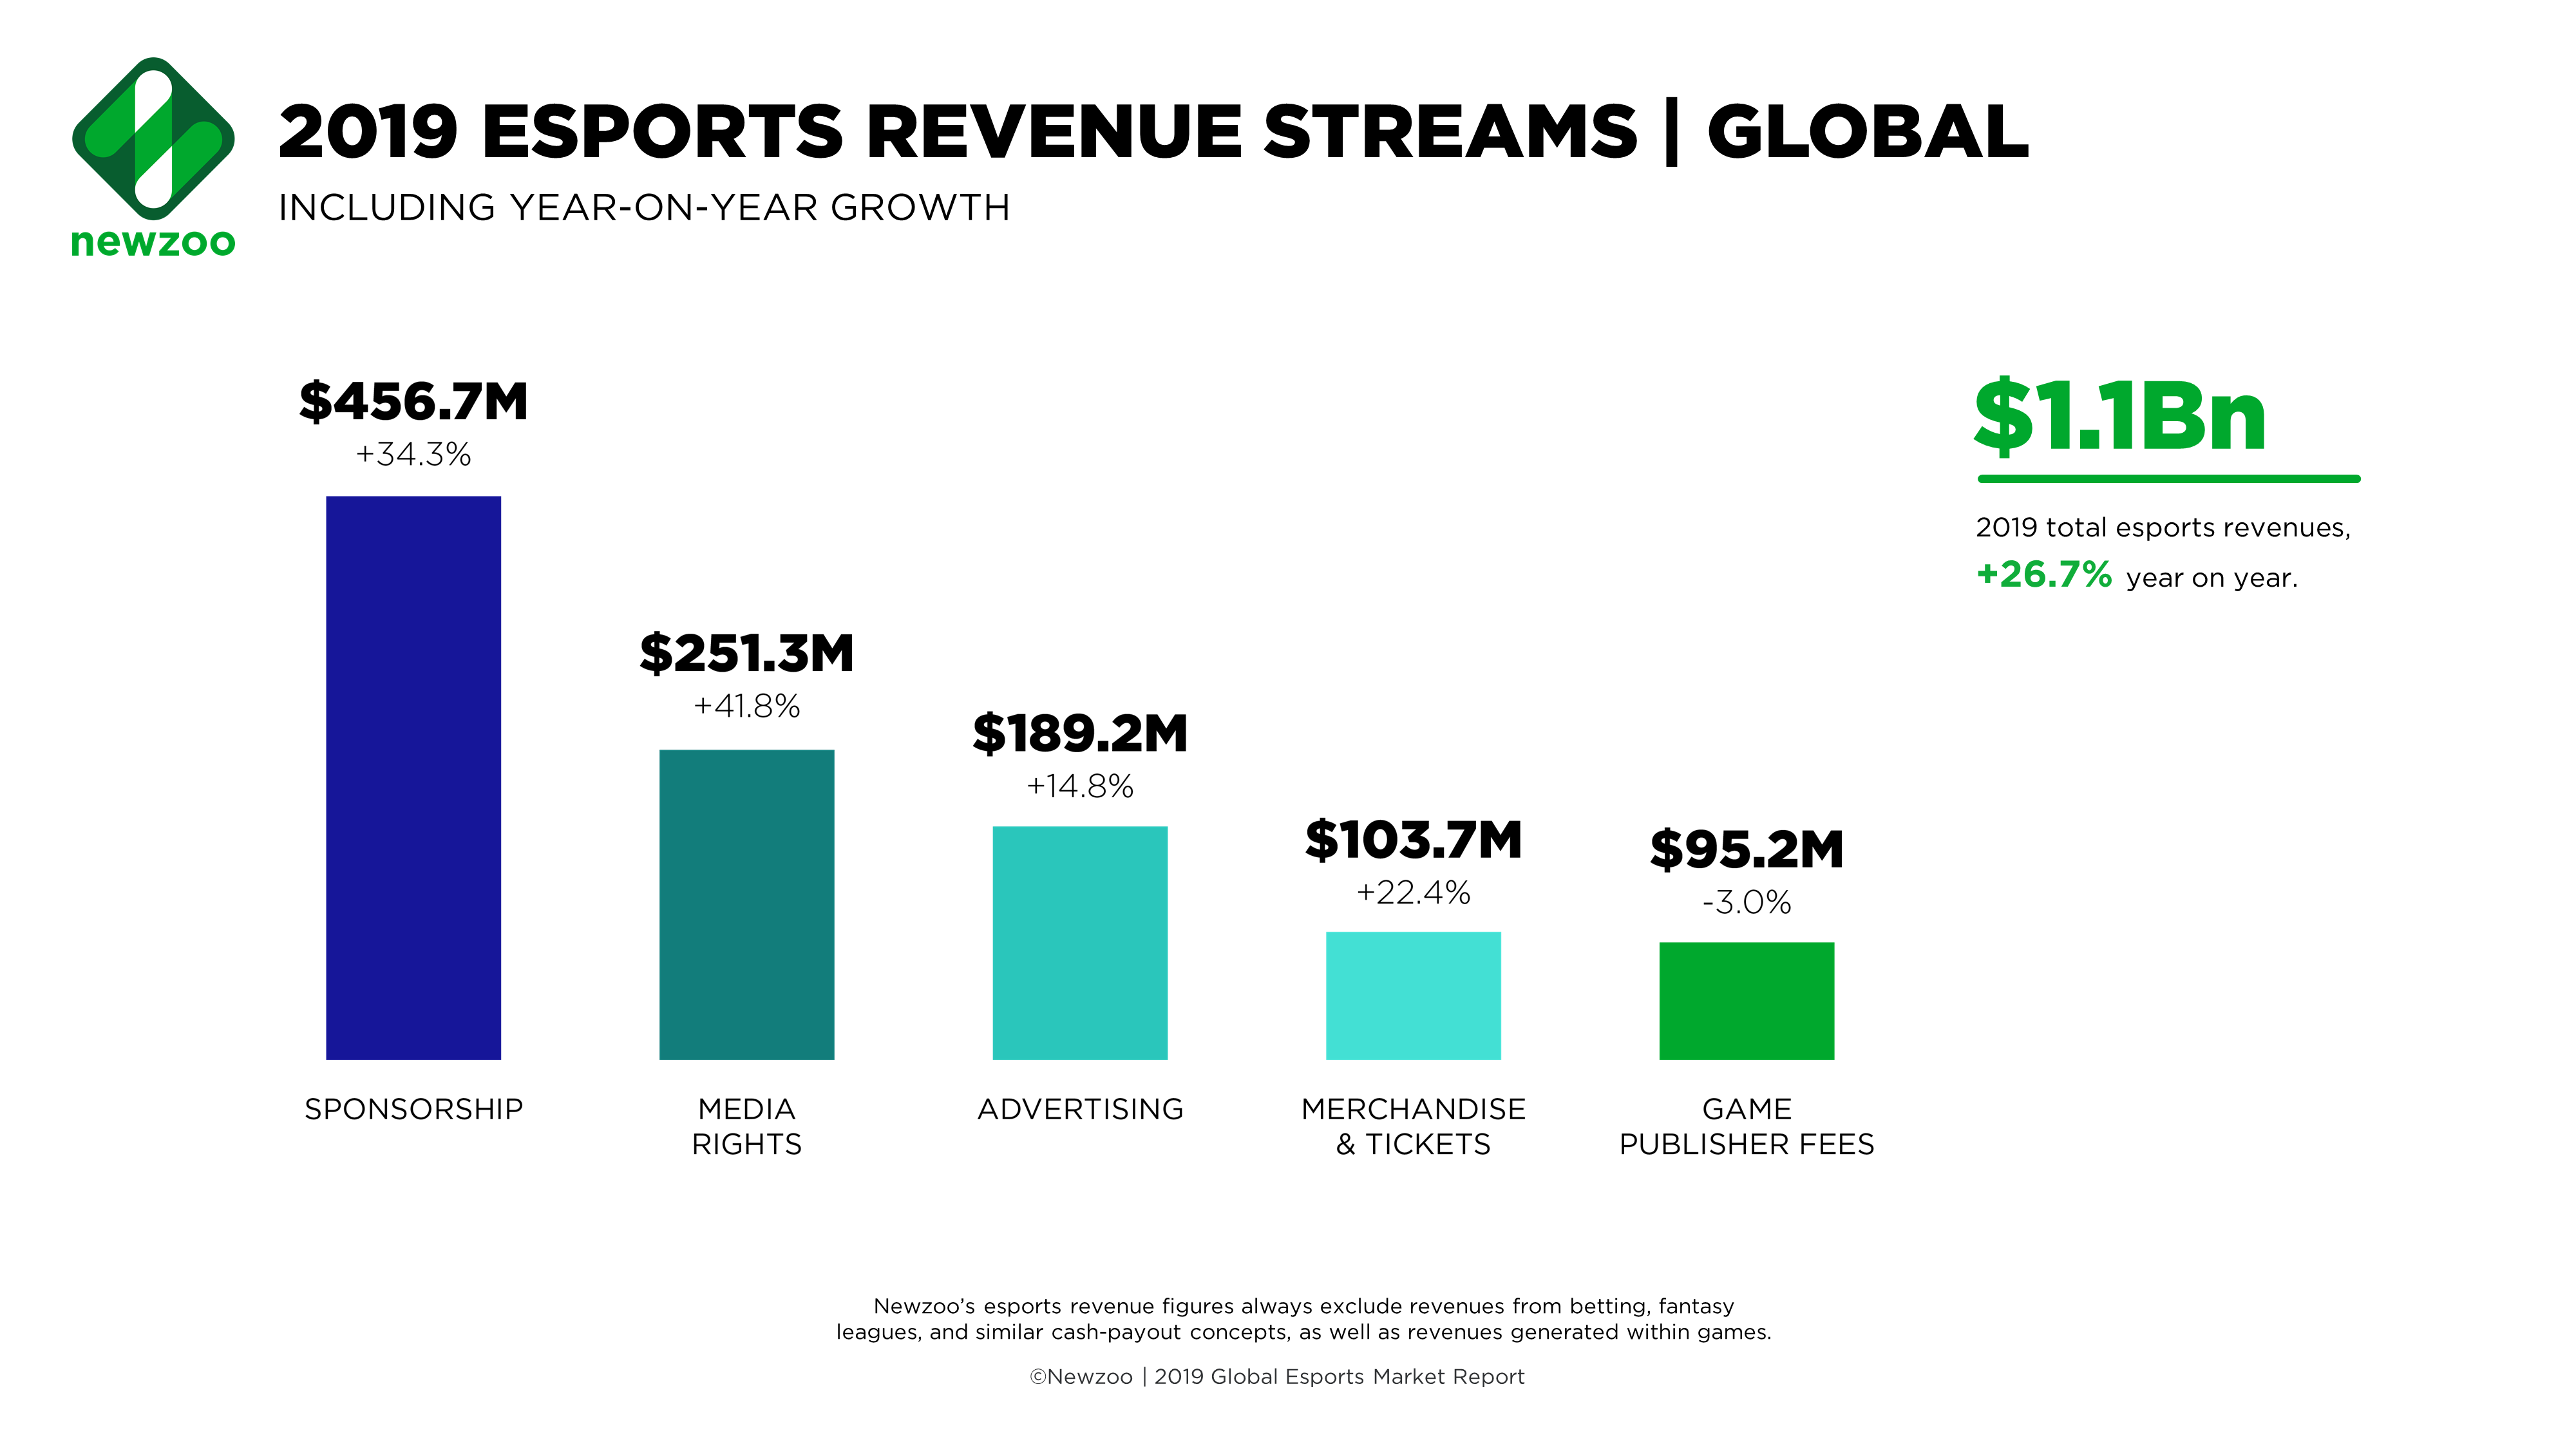 Newzoo_Esports_Revenue_Streams_Global_Feb2019-1